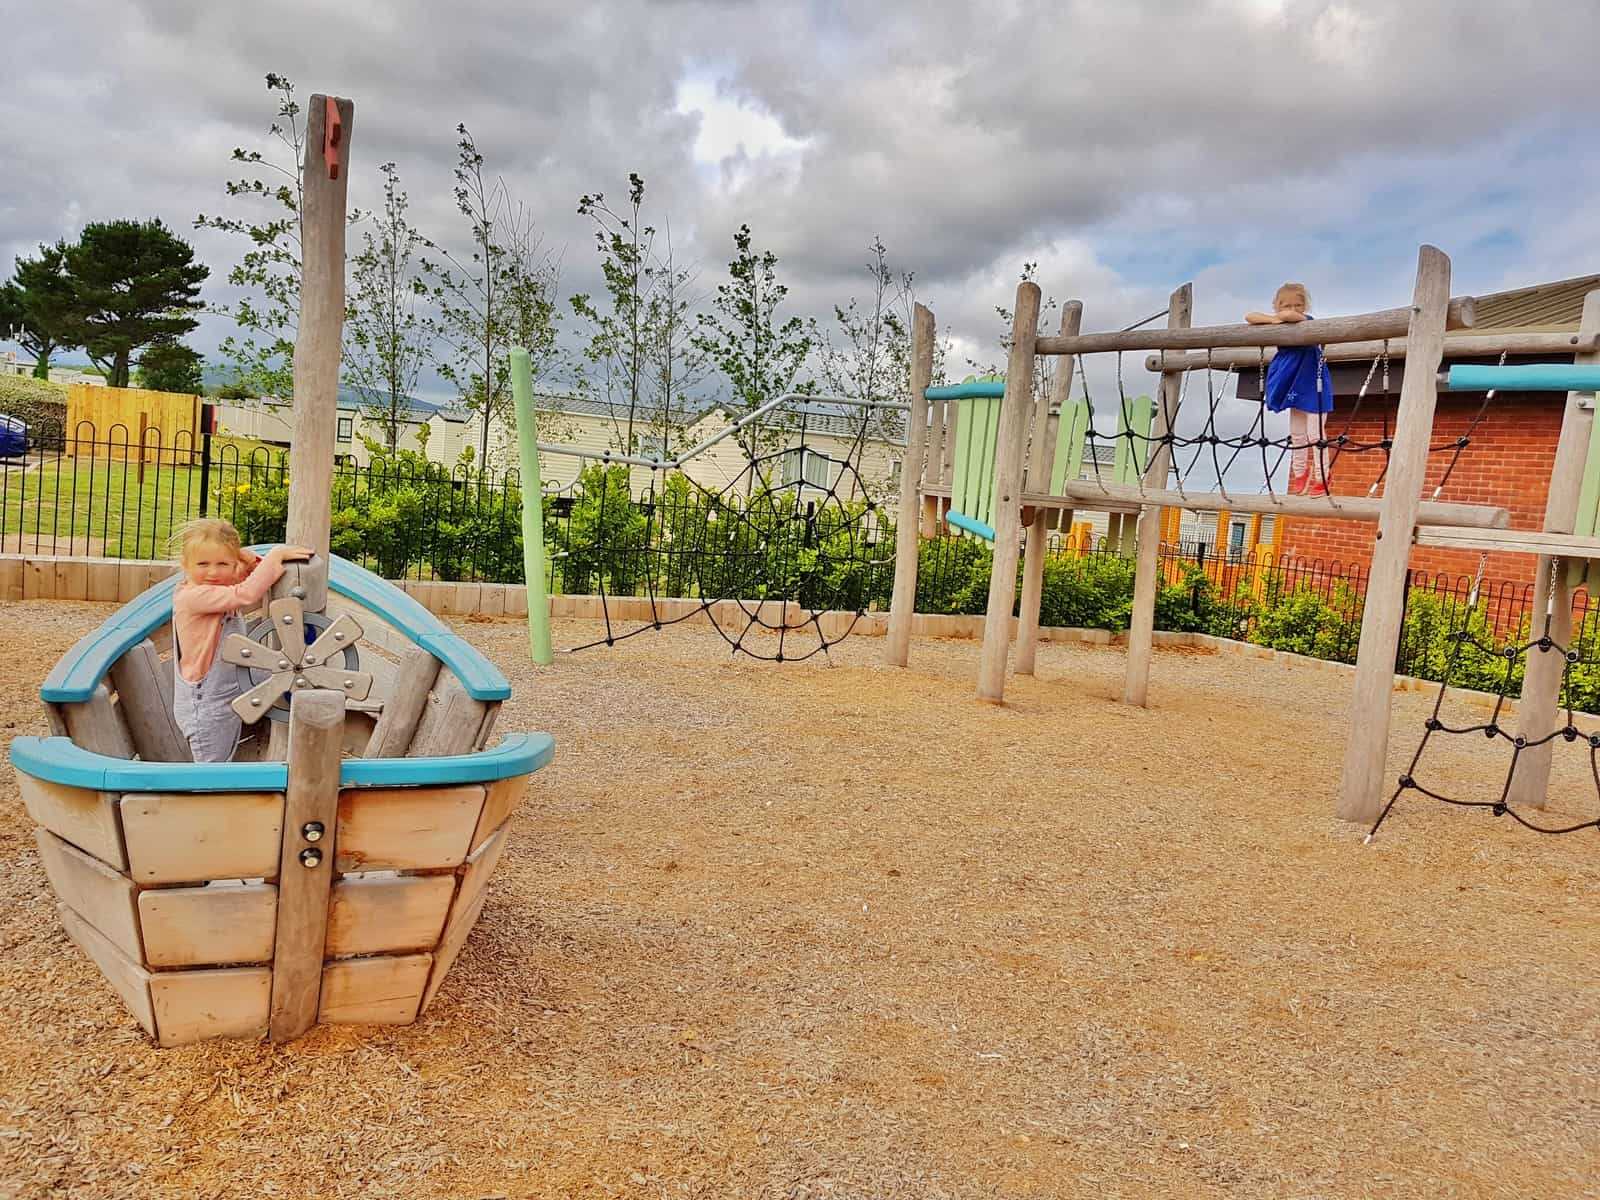 Hoburne Blue Anchor playground